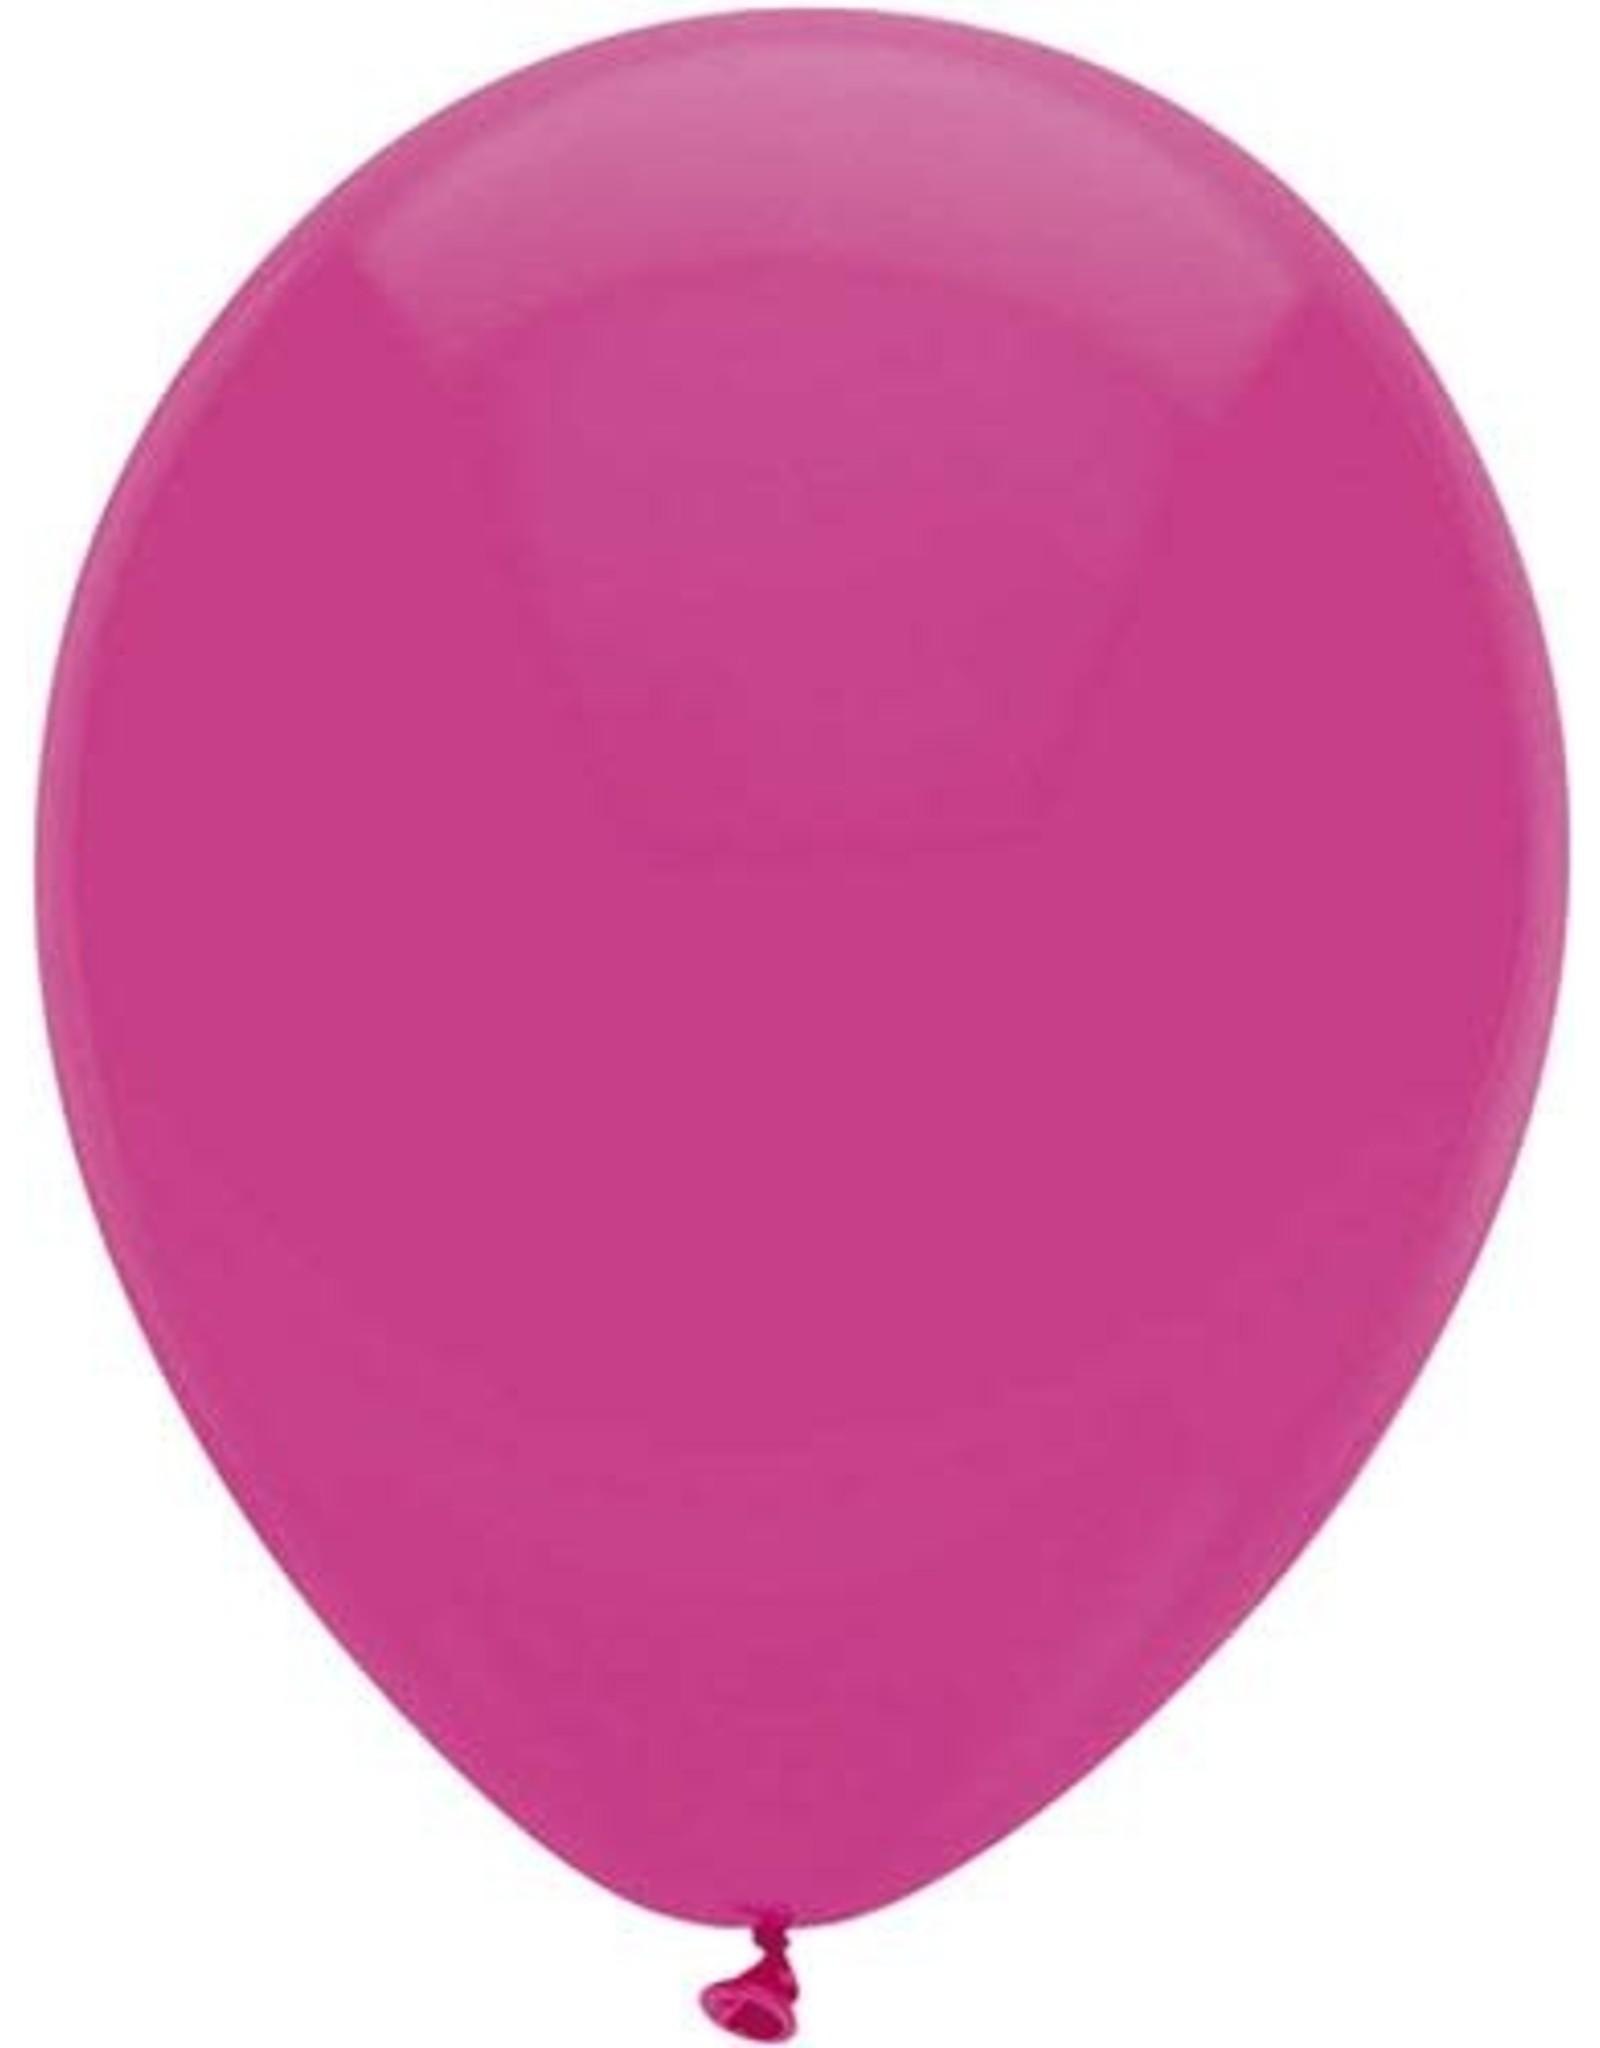 Ballonnen Uni Hot Pink (30 cm, 100 stuks)